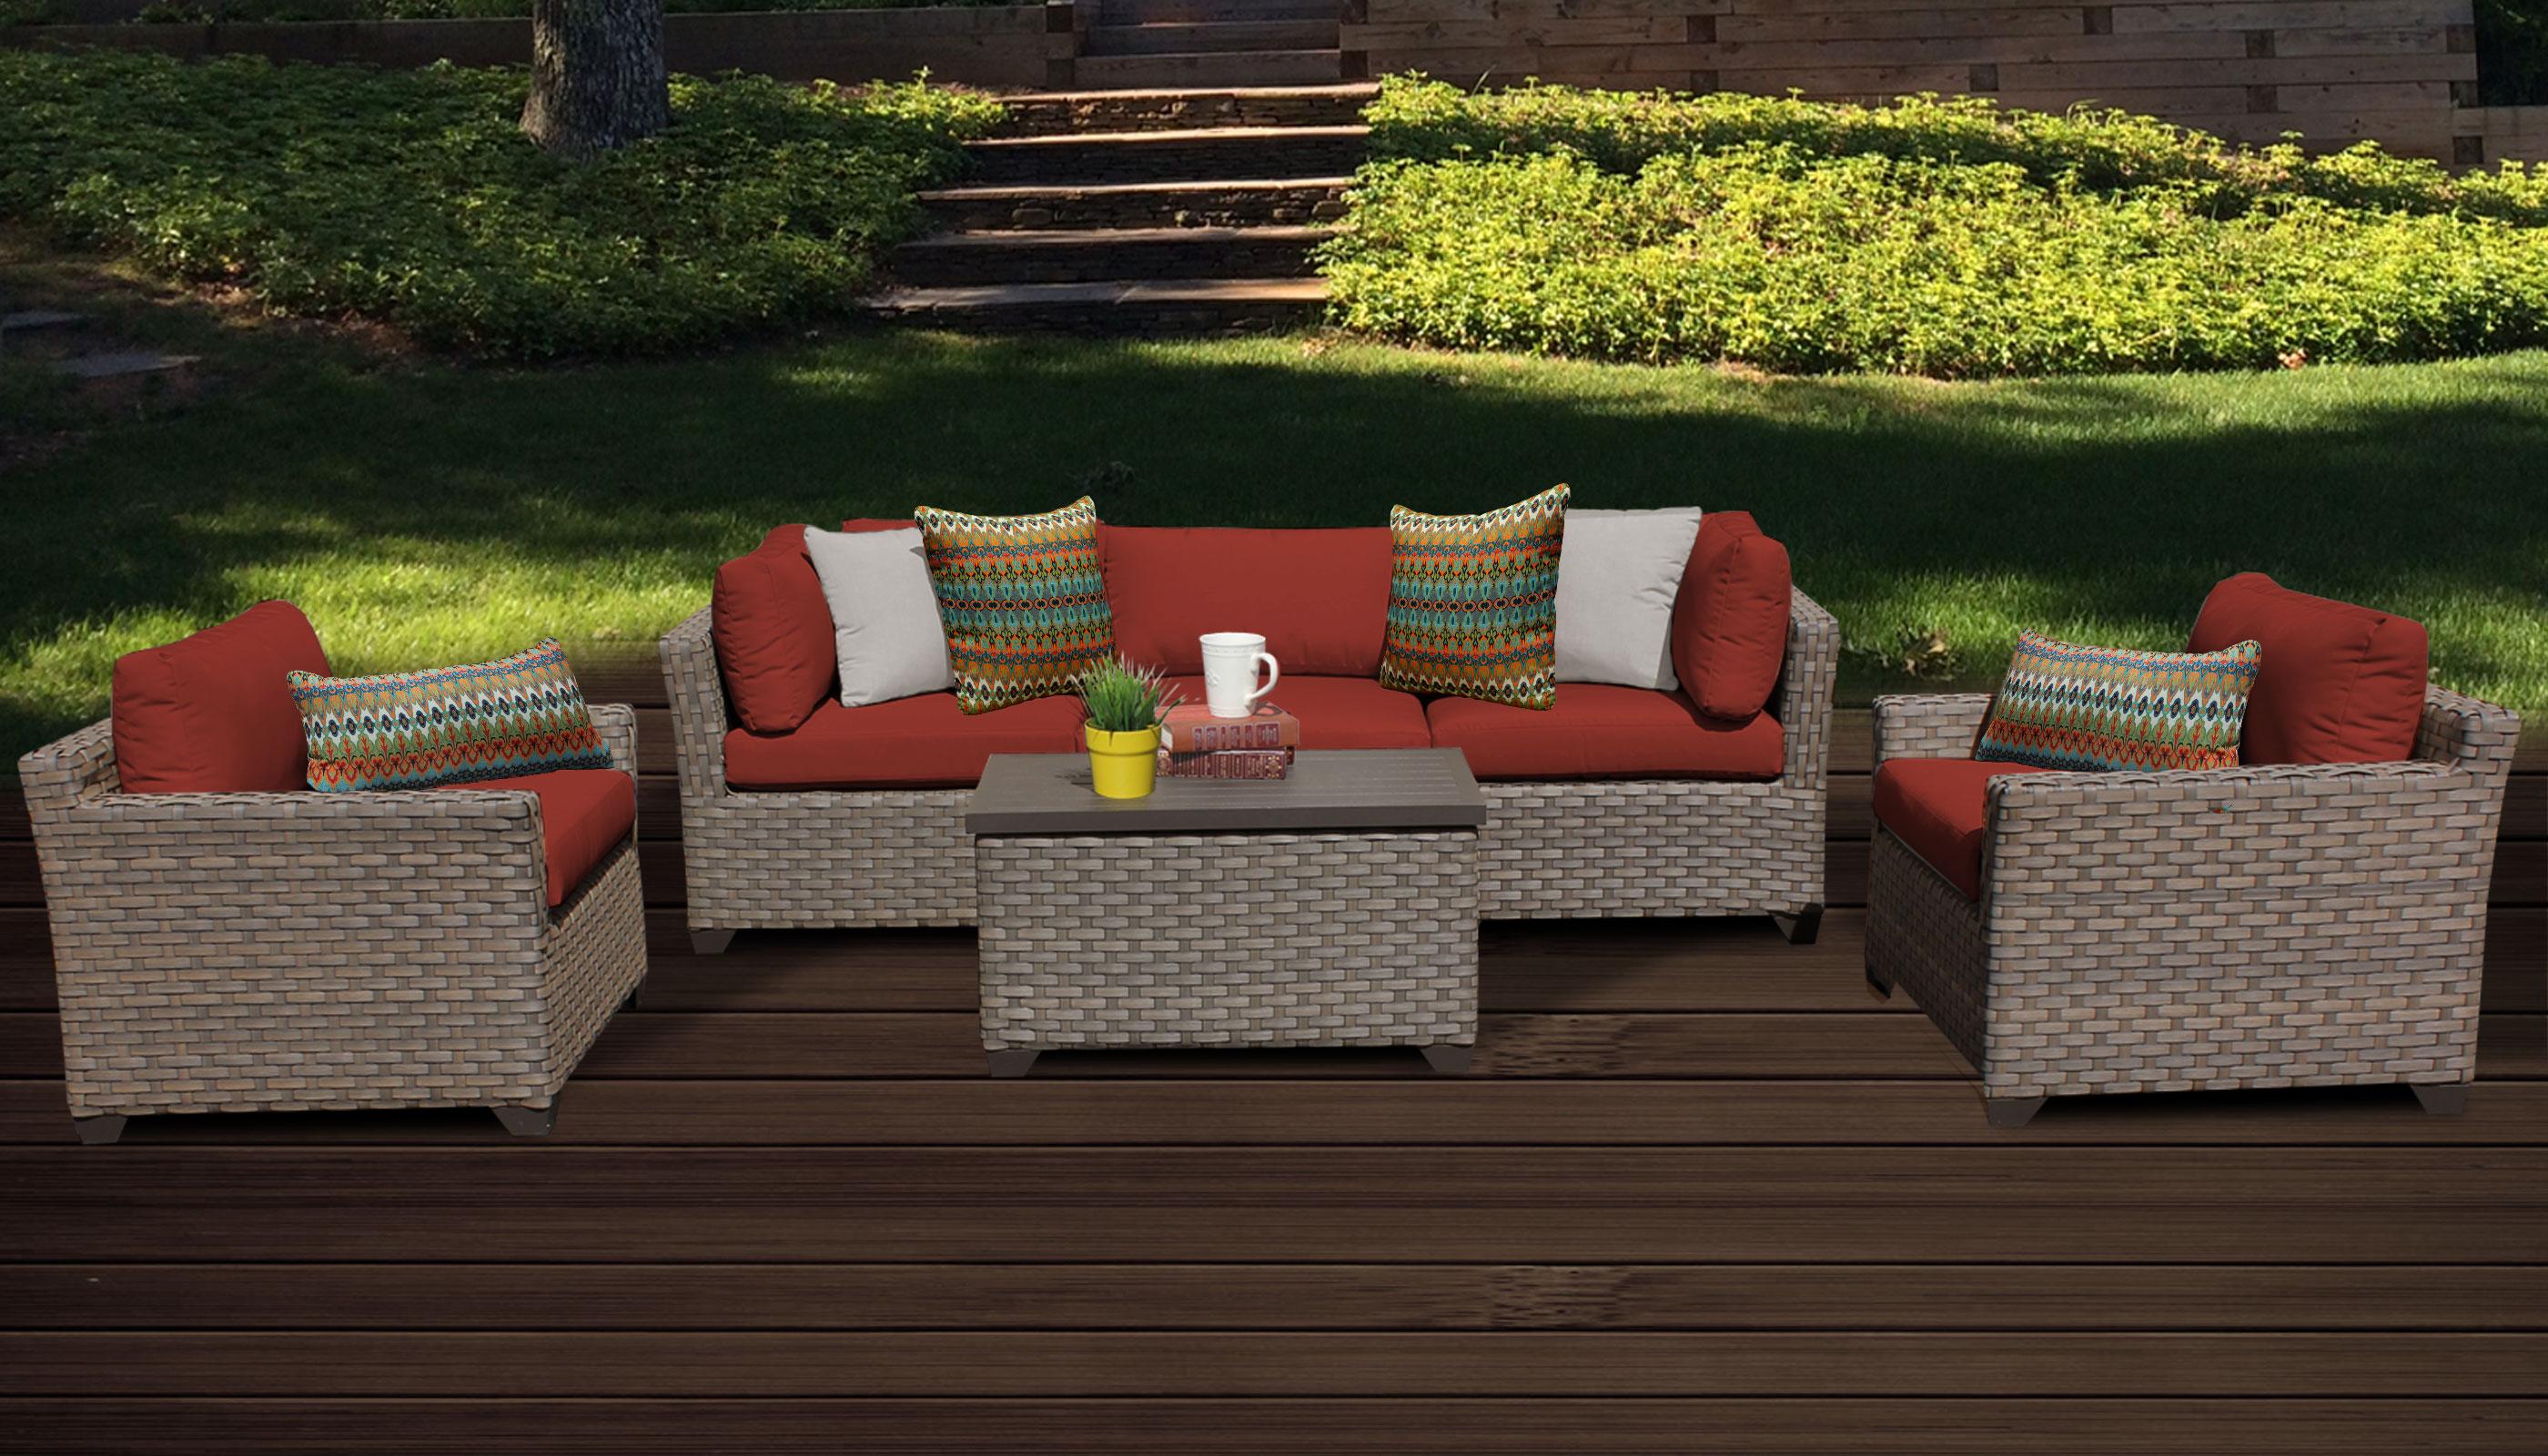 Monterey 6 Piece Outdoor Wicker Patio Furniture Set 06b -